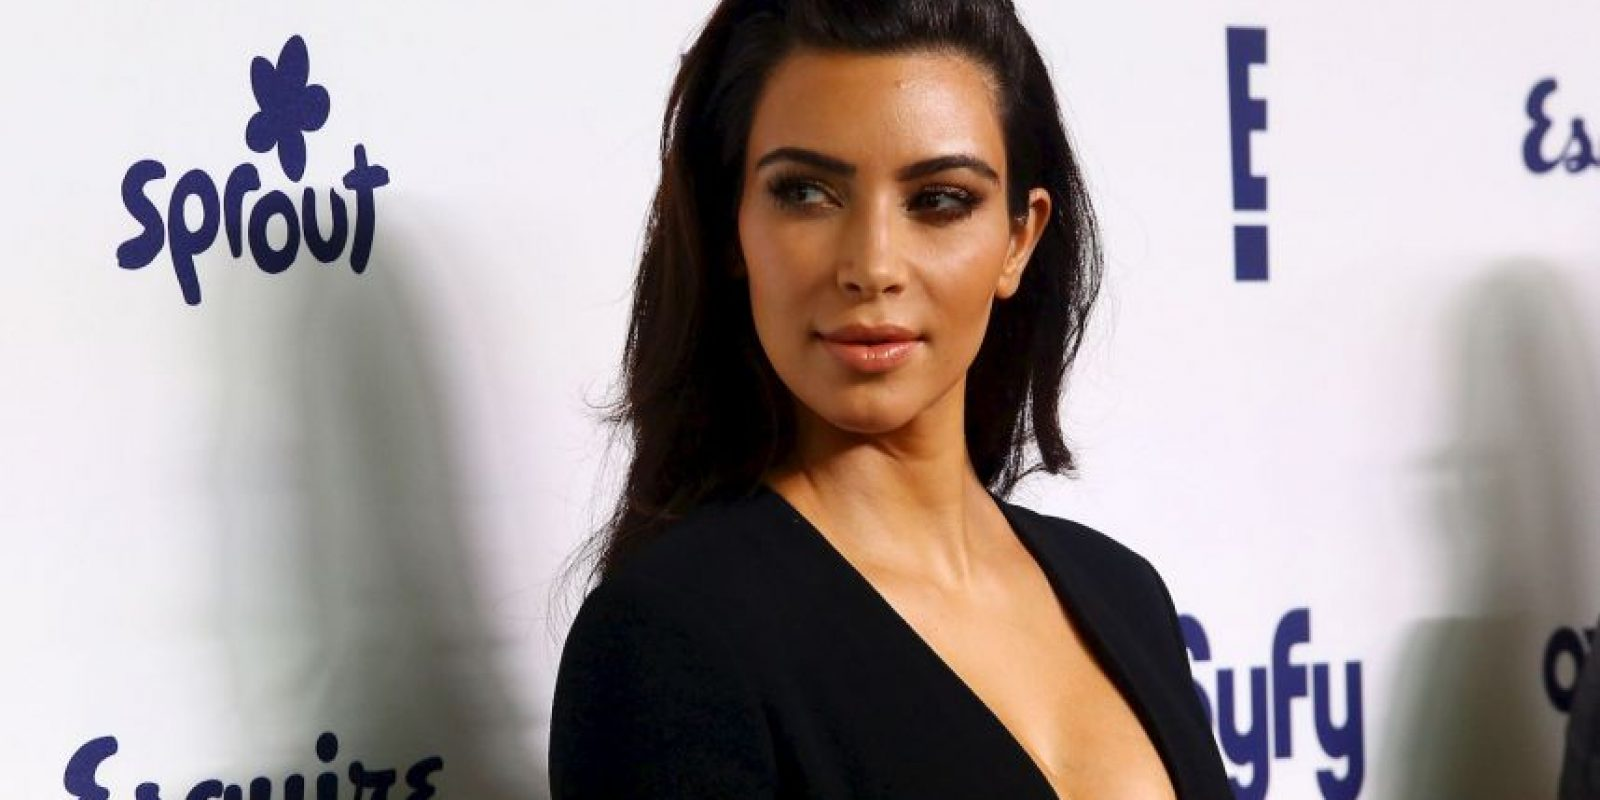 Su verdadero nombre es Kimberly Noel Kardashian Foto:Getty Images